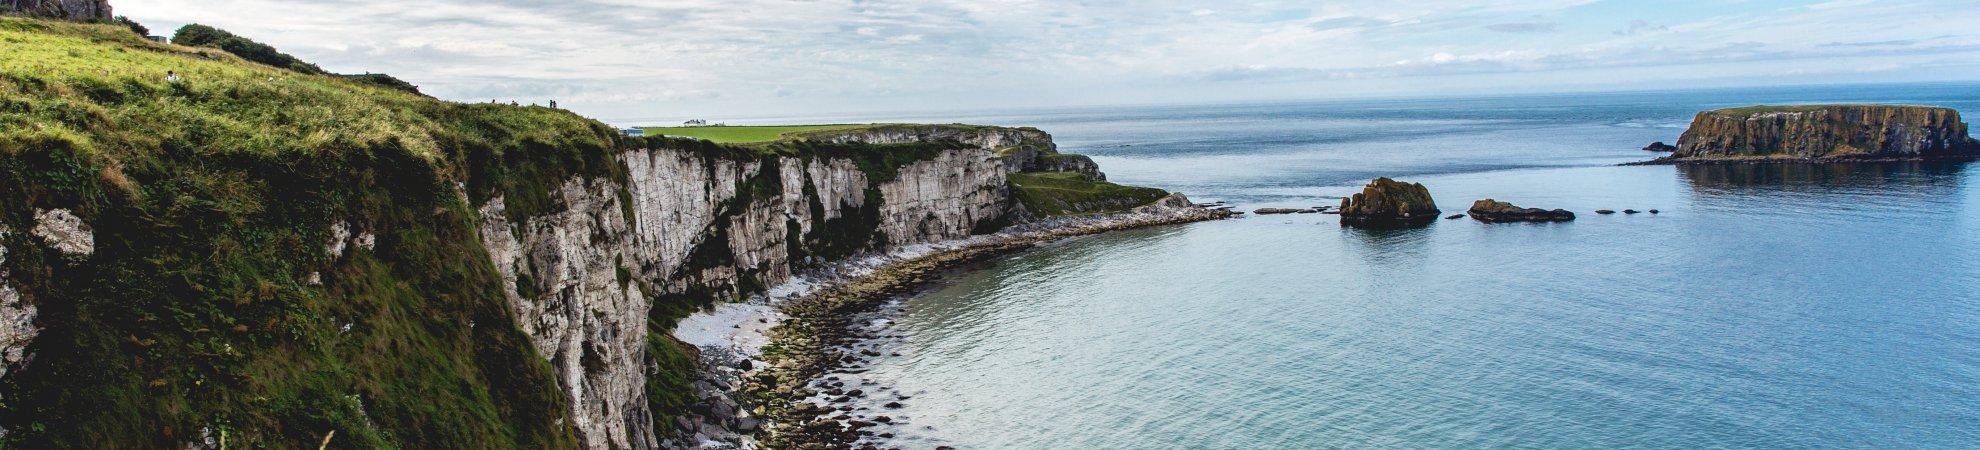 Best Coastal Walks in Ireland